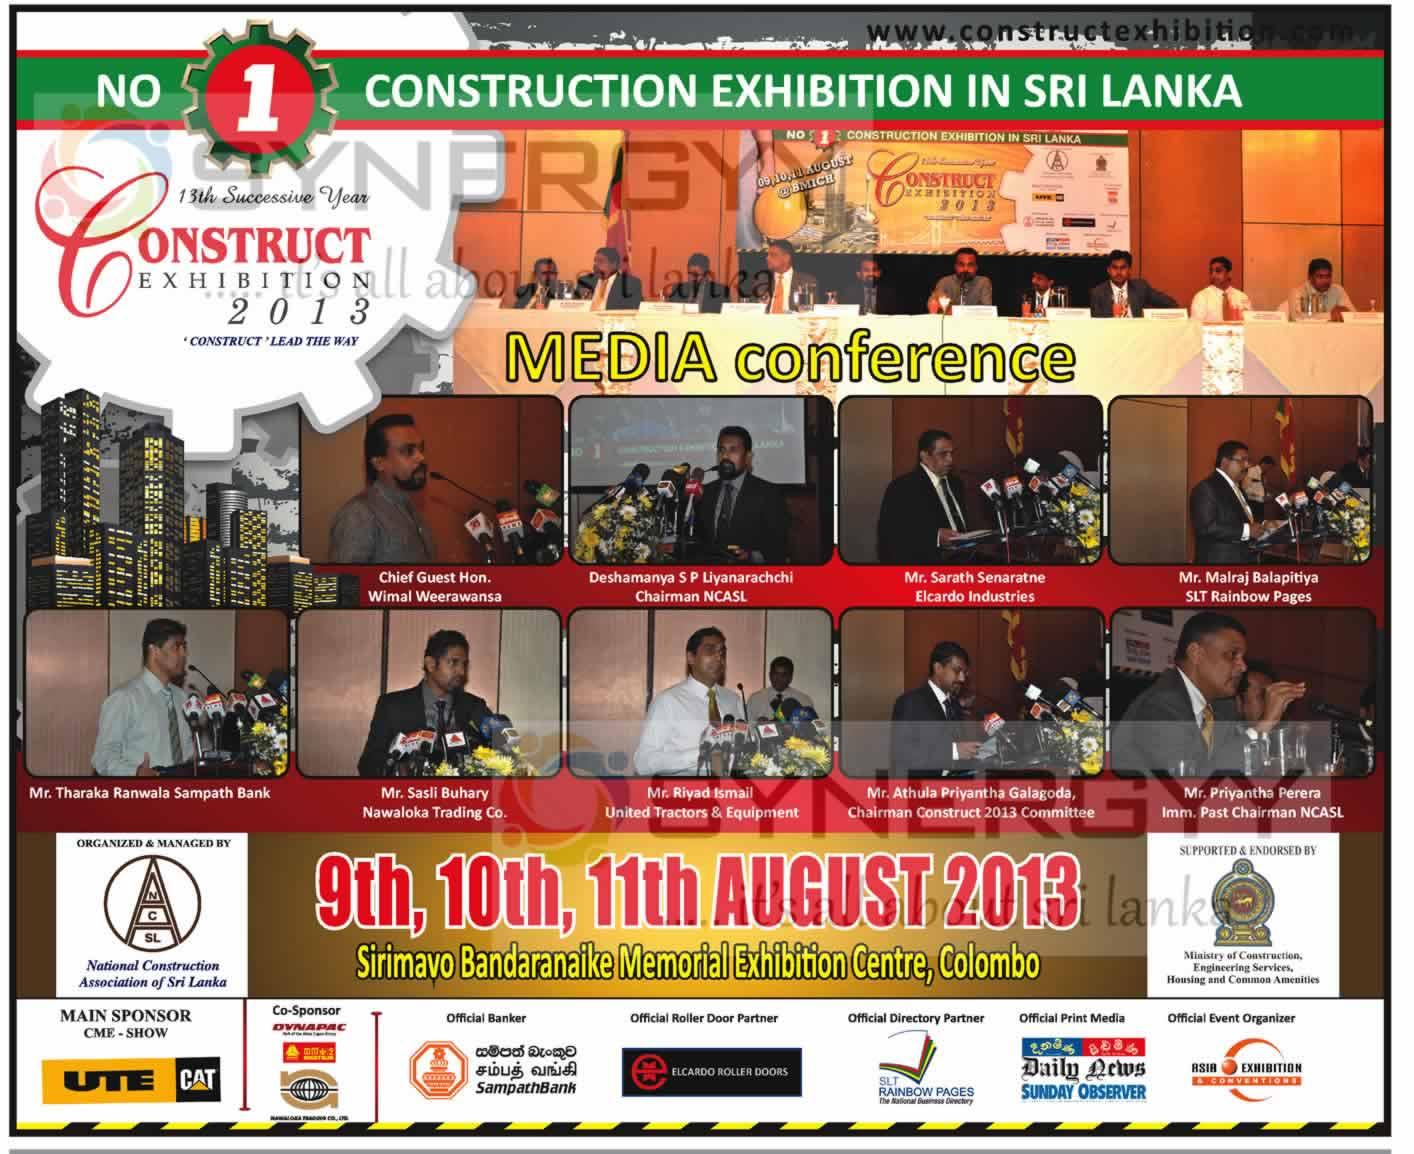 Exhibition Stall Builders In Sri Lanka : Construction exhibition in sri lanka synergyy